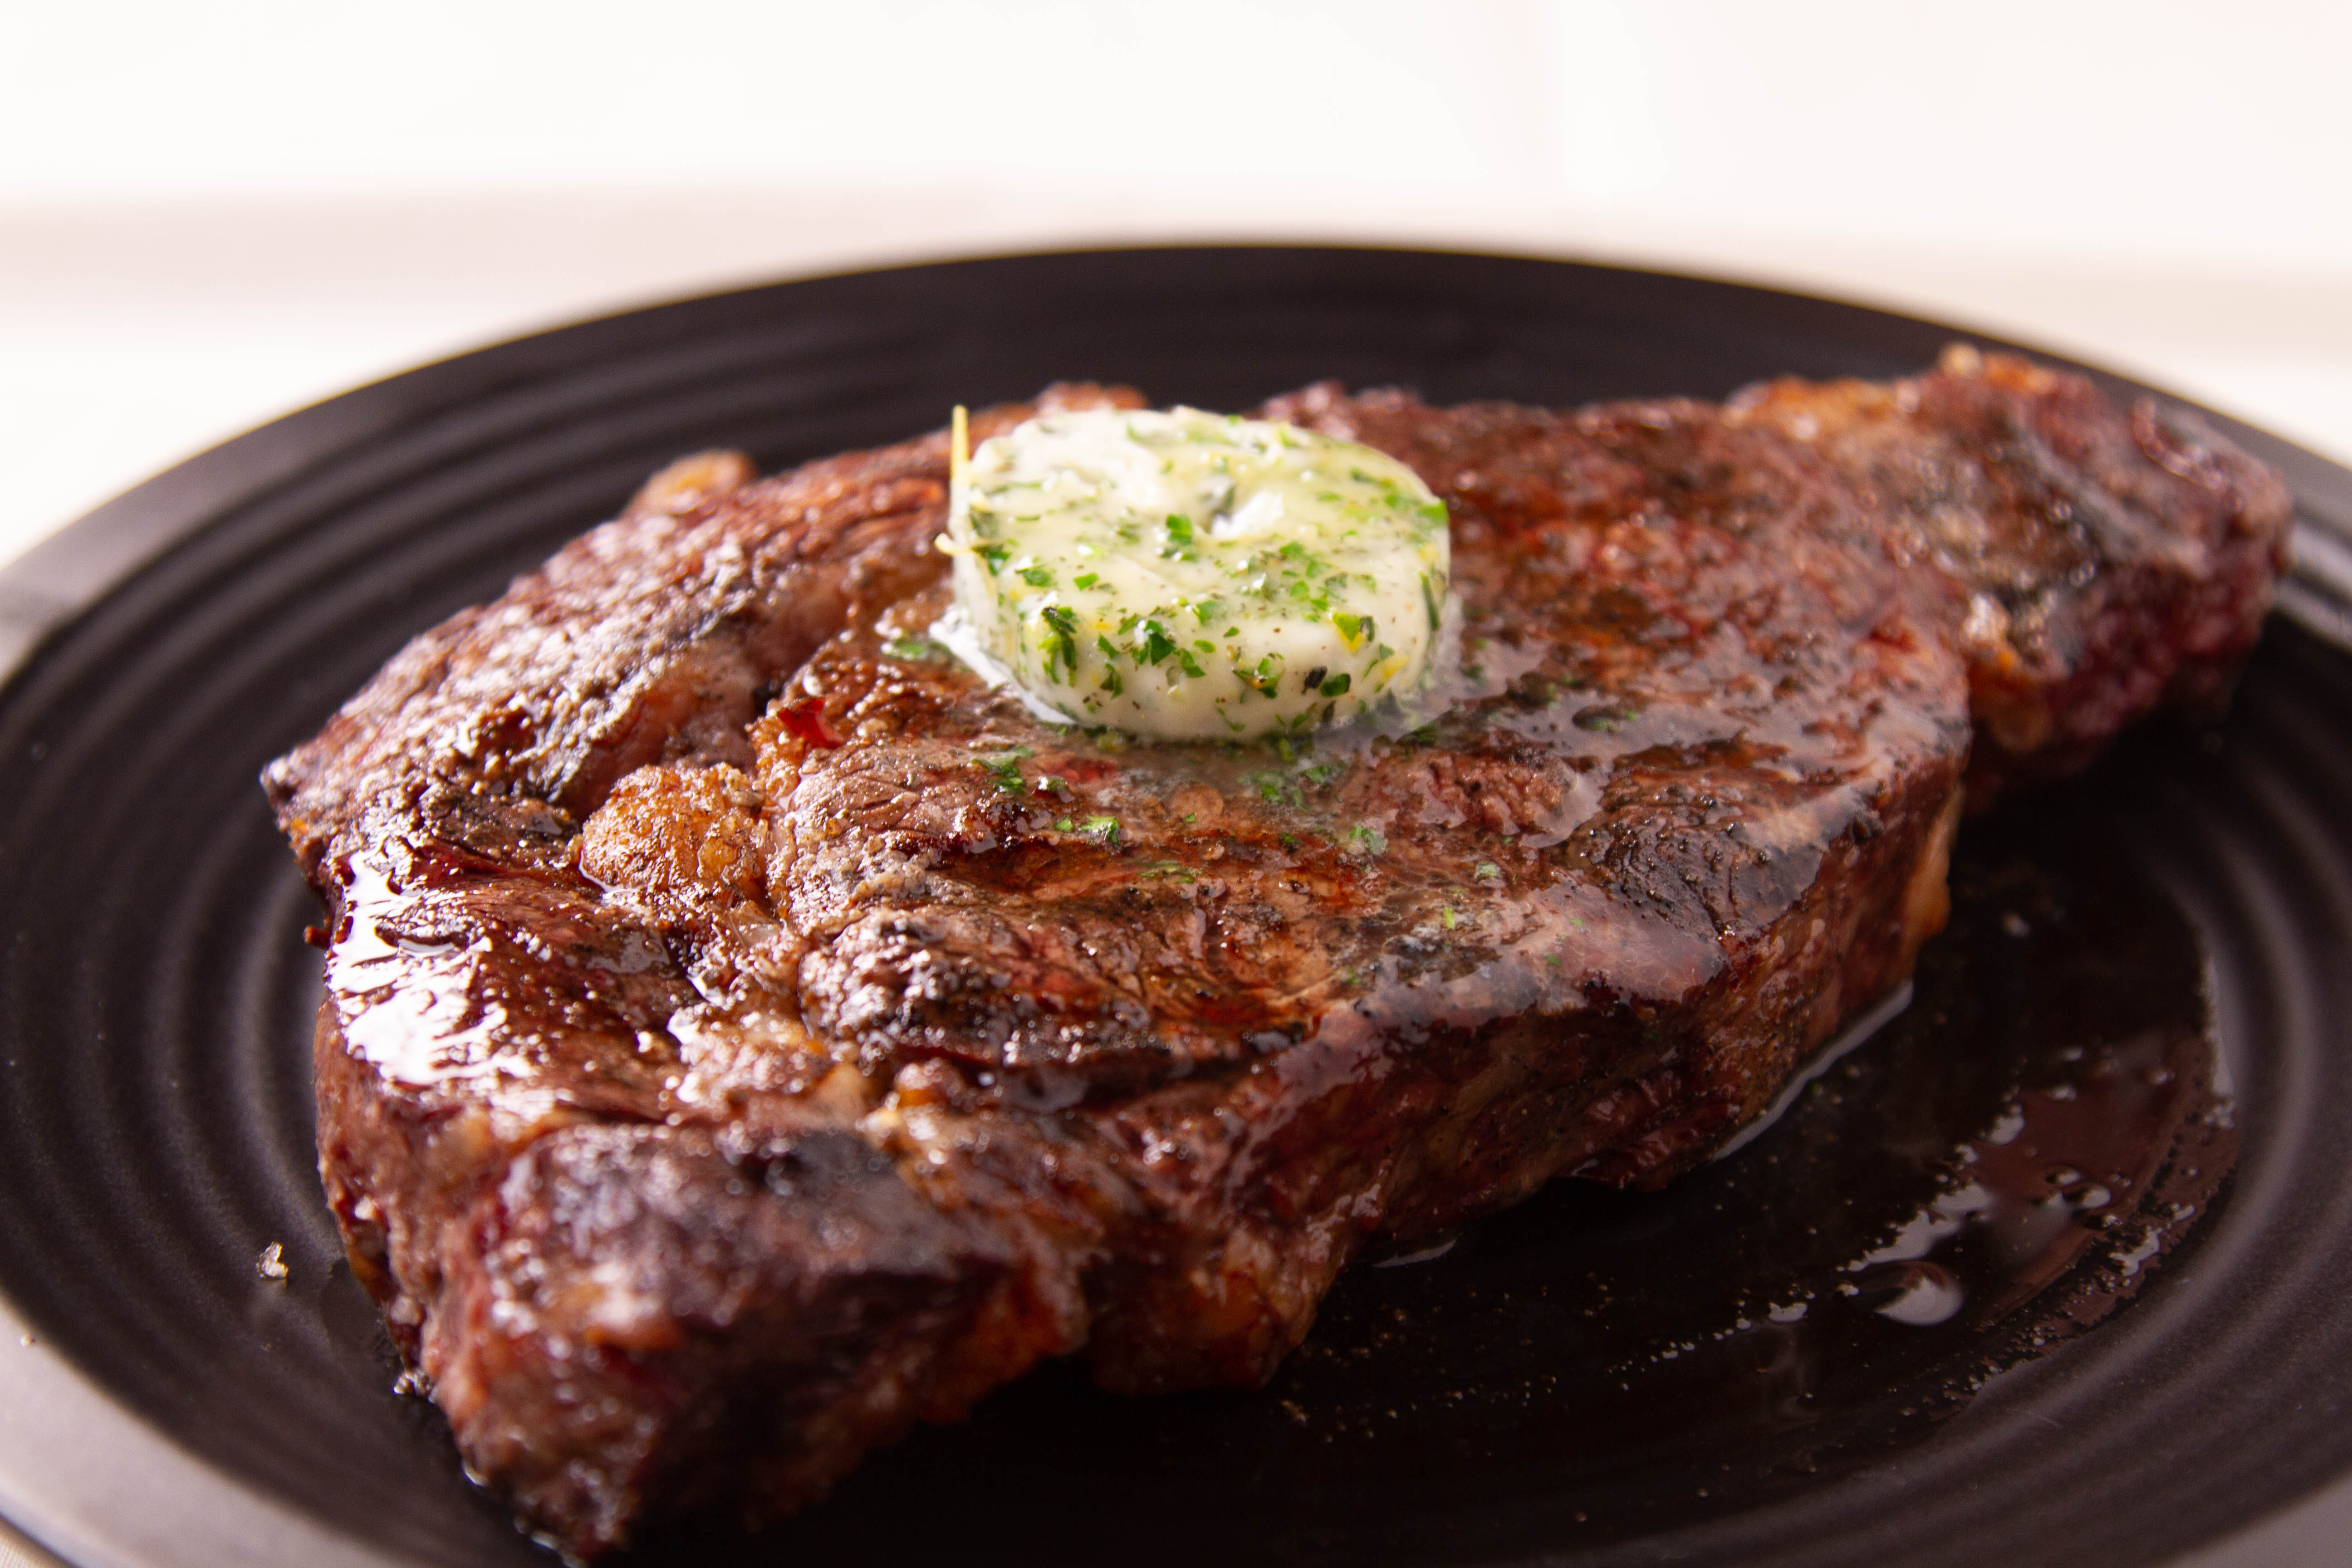 Grilled rib eye steak recipe, reverse sear | ThermoWorks